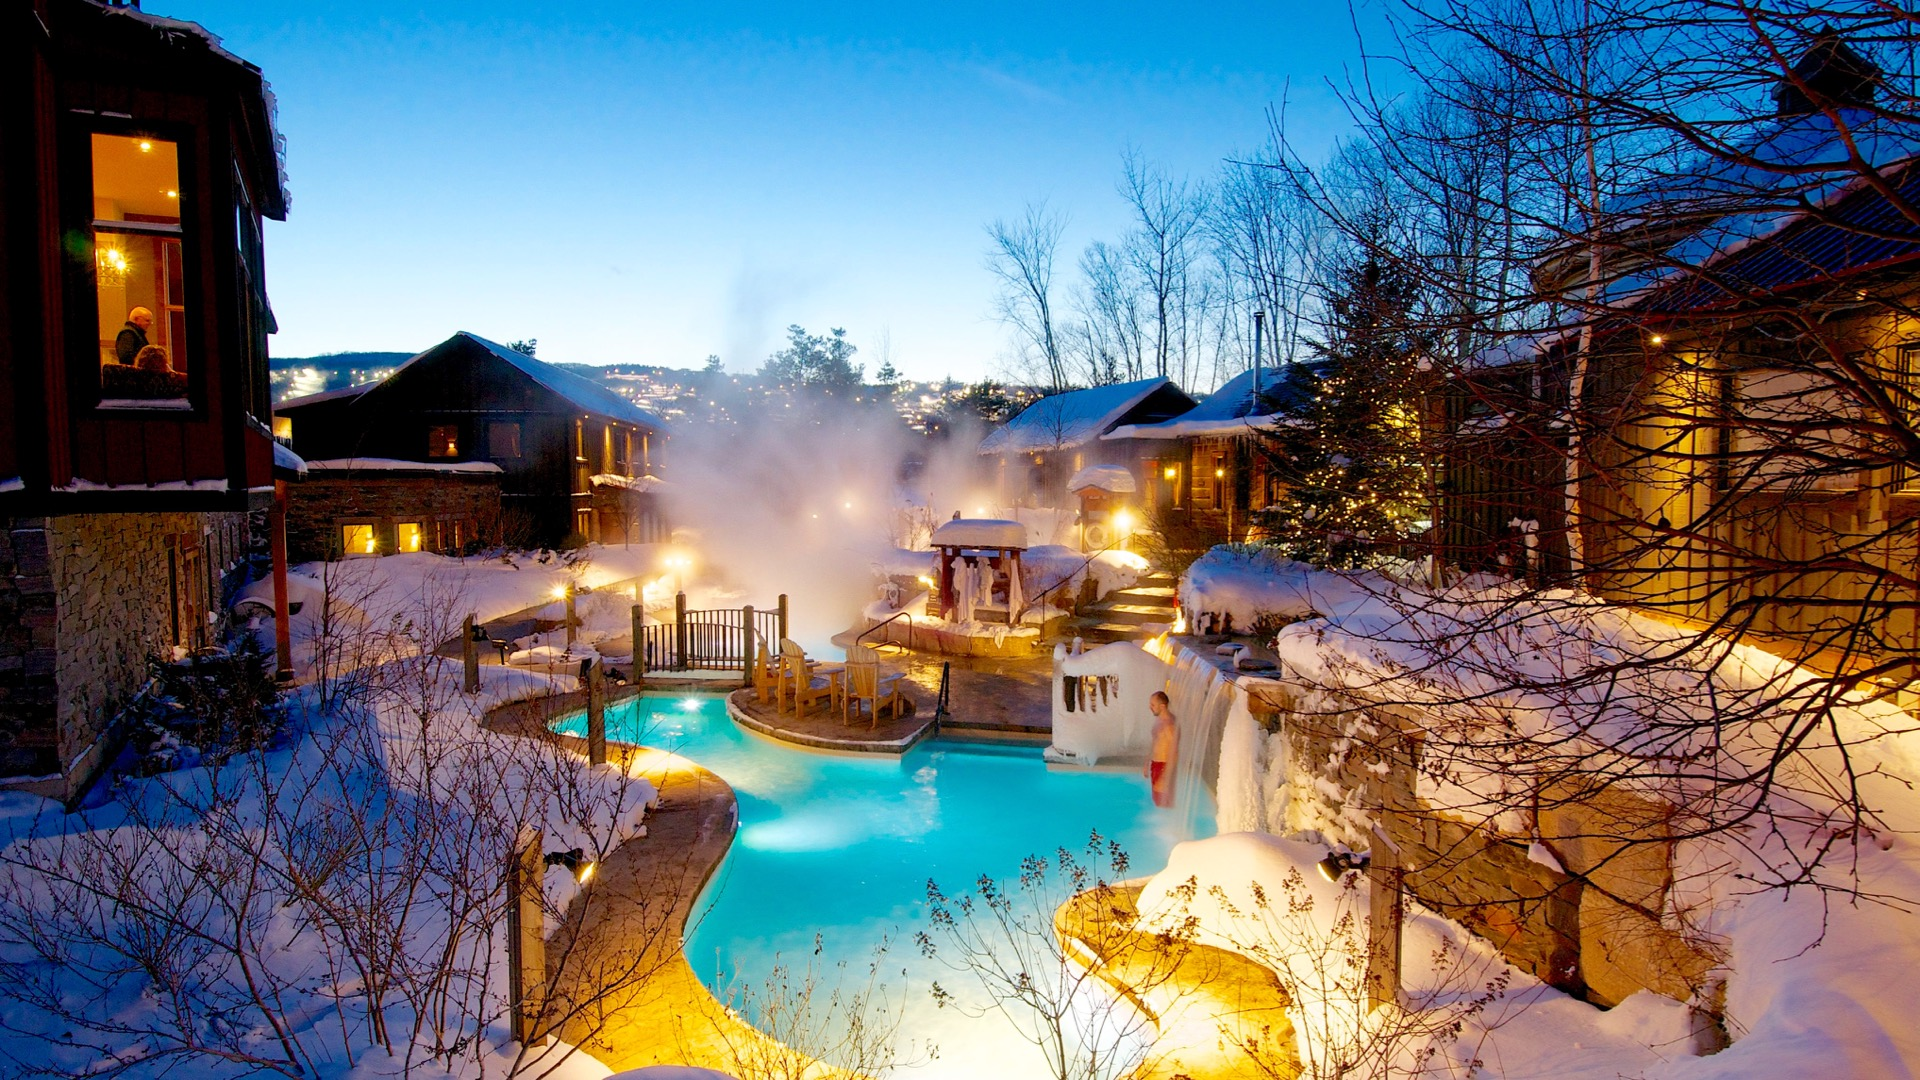 Scandinave spa blue mountain celebrates 10th anniversary - Spa scandinave ...